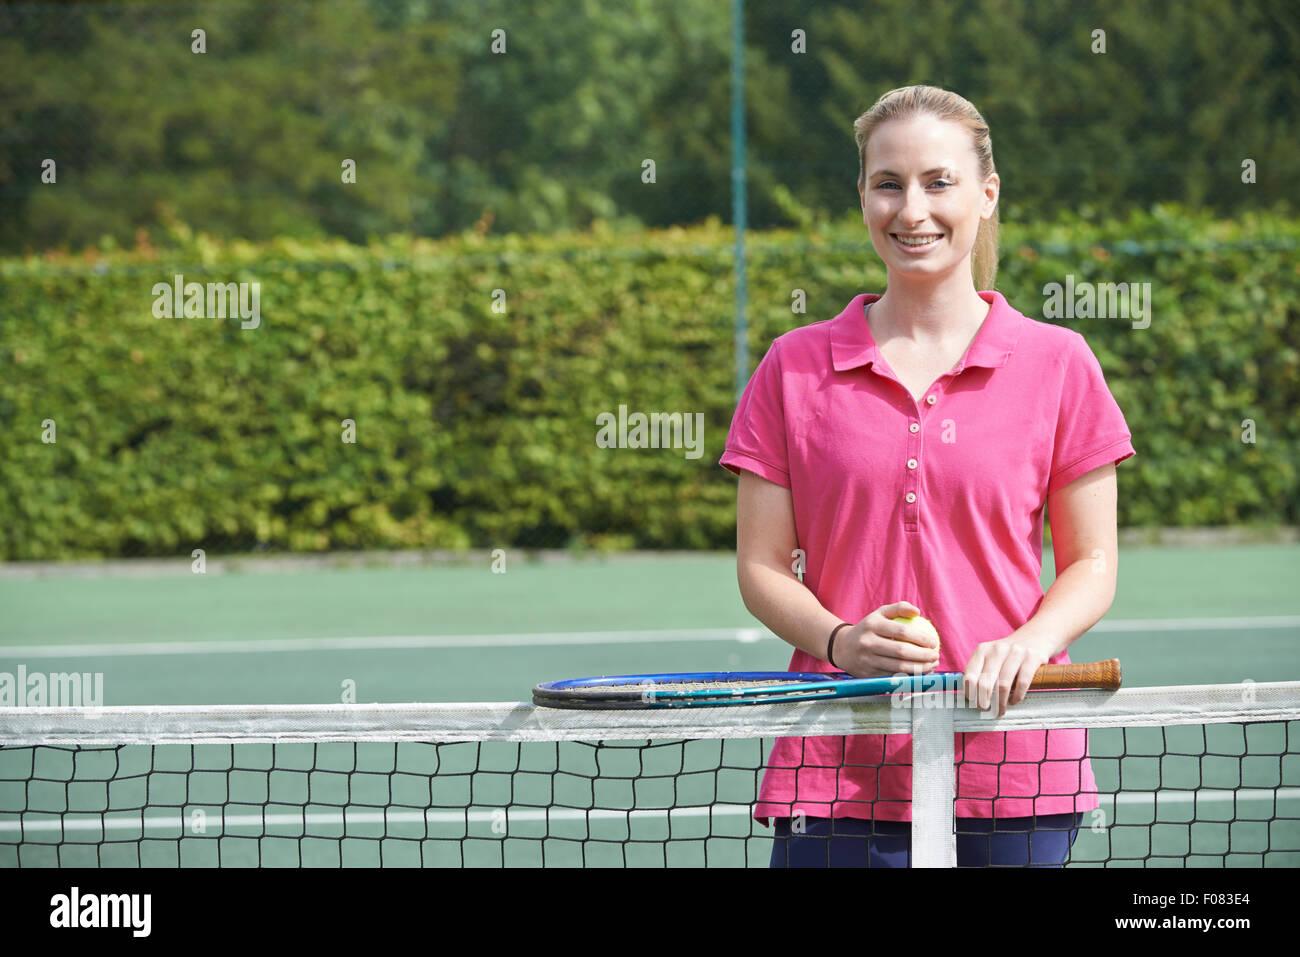 Portrait Of Female Tennis Coach On Court - Stock Image